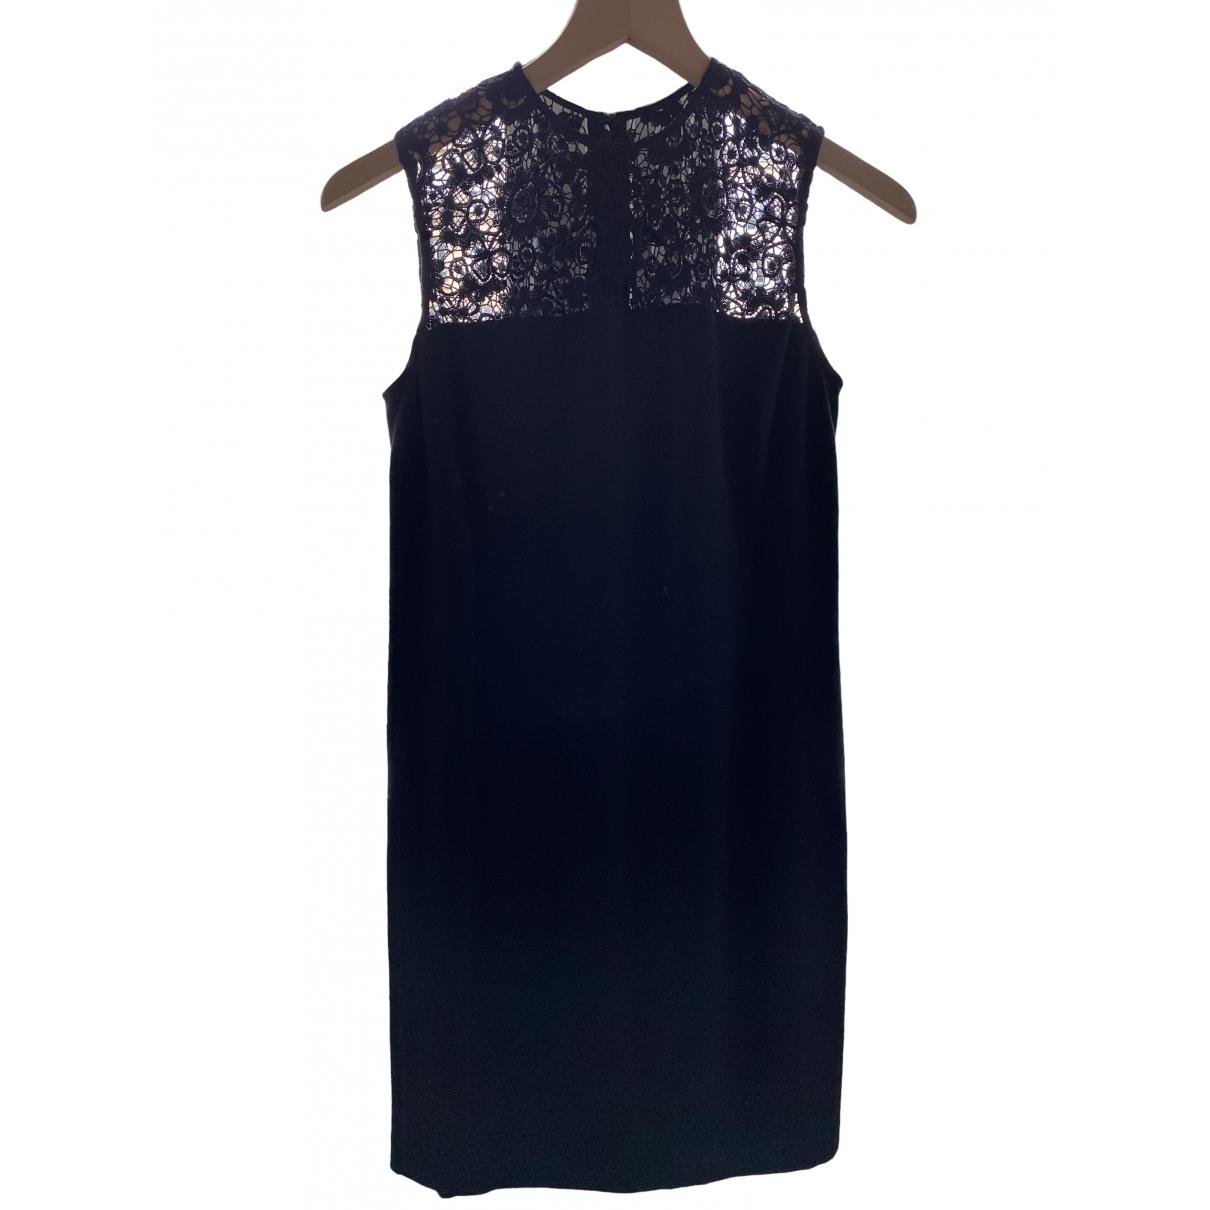 Lauren Ralph Lauren \N Kleid in  Schwarz Baumwolle - Elasthan